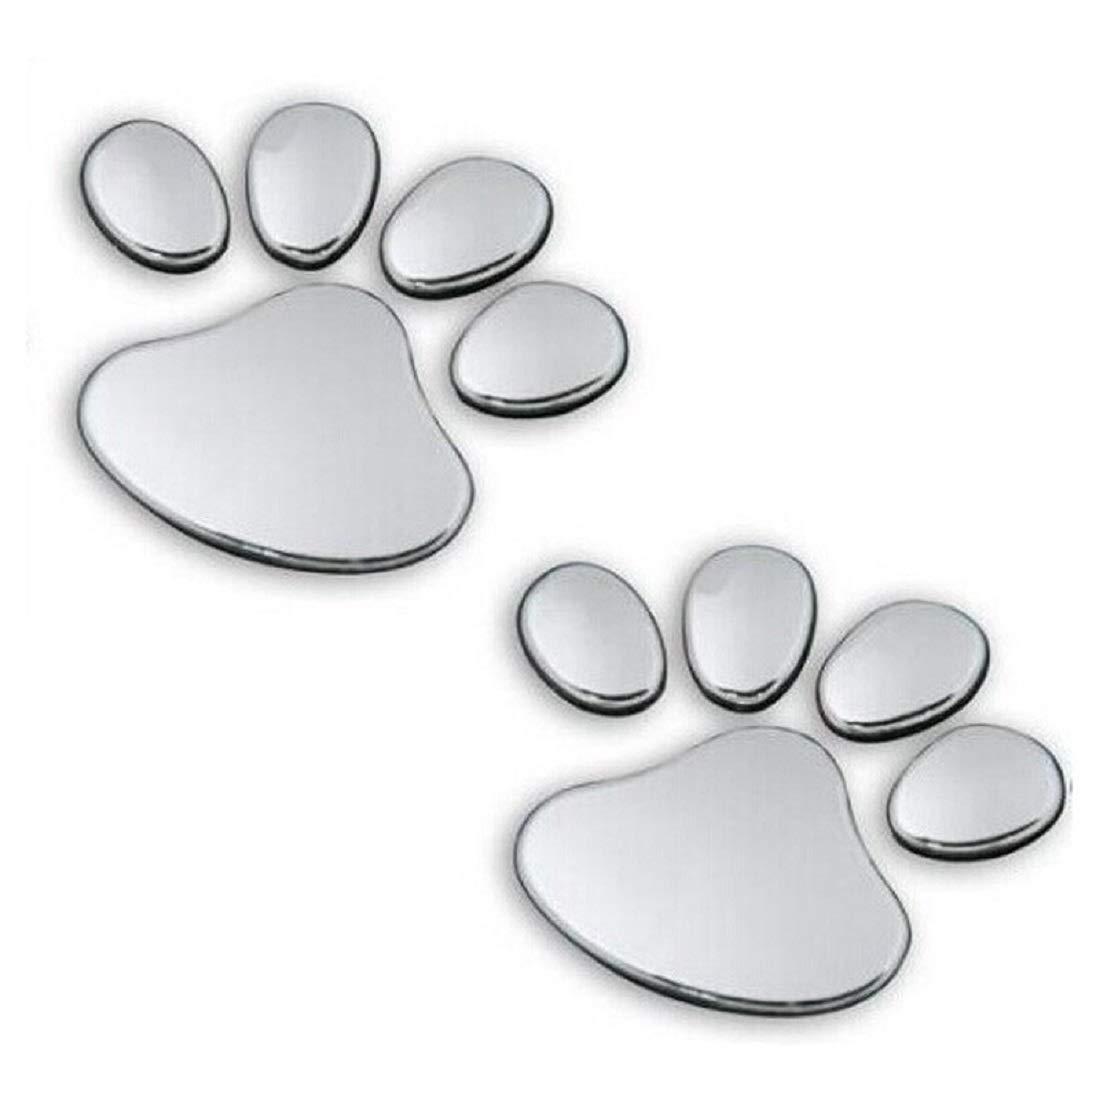 3D Sticker, Chrome Dog Footprints Pet Animal Paw Truck Car Emblem Decal Decoration (Sliver)